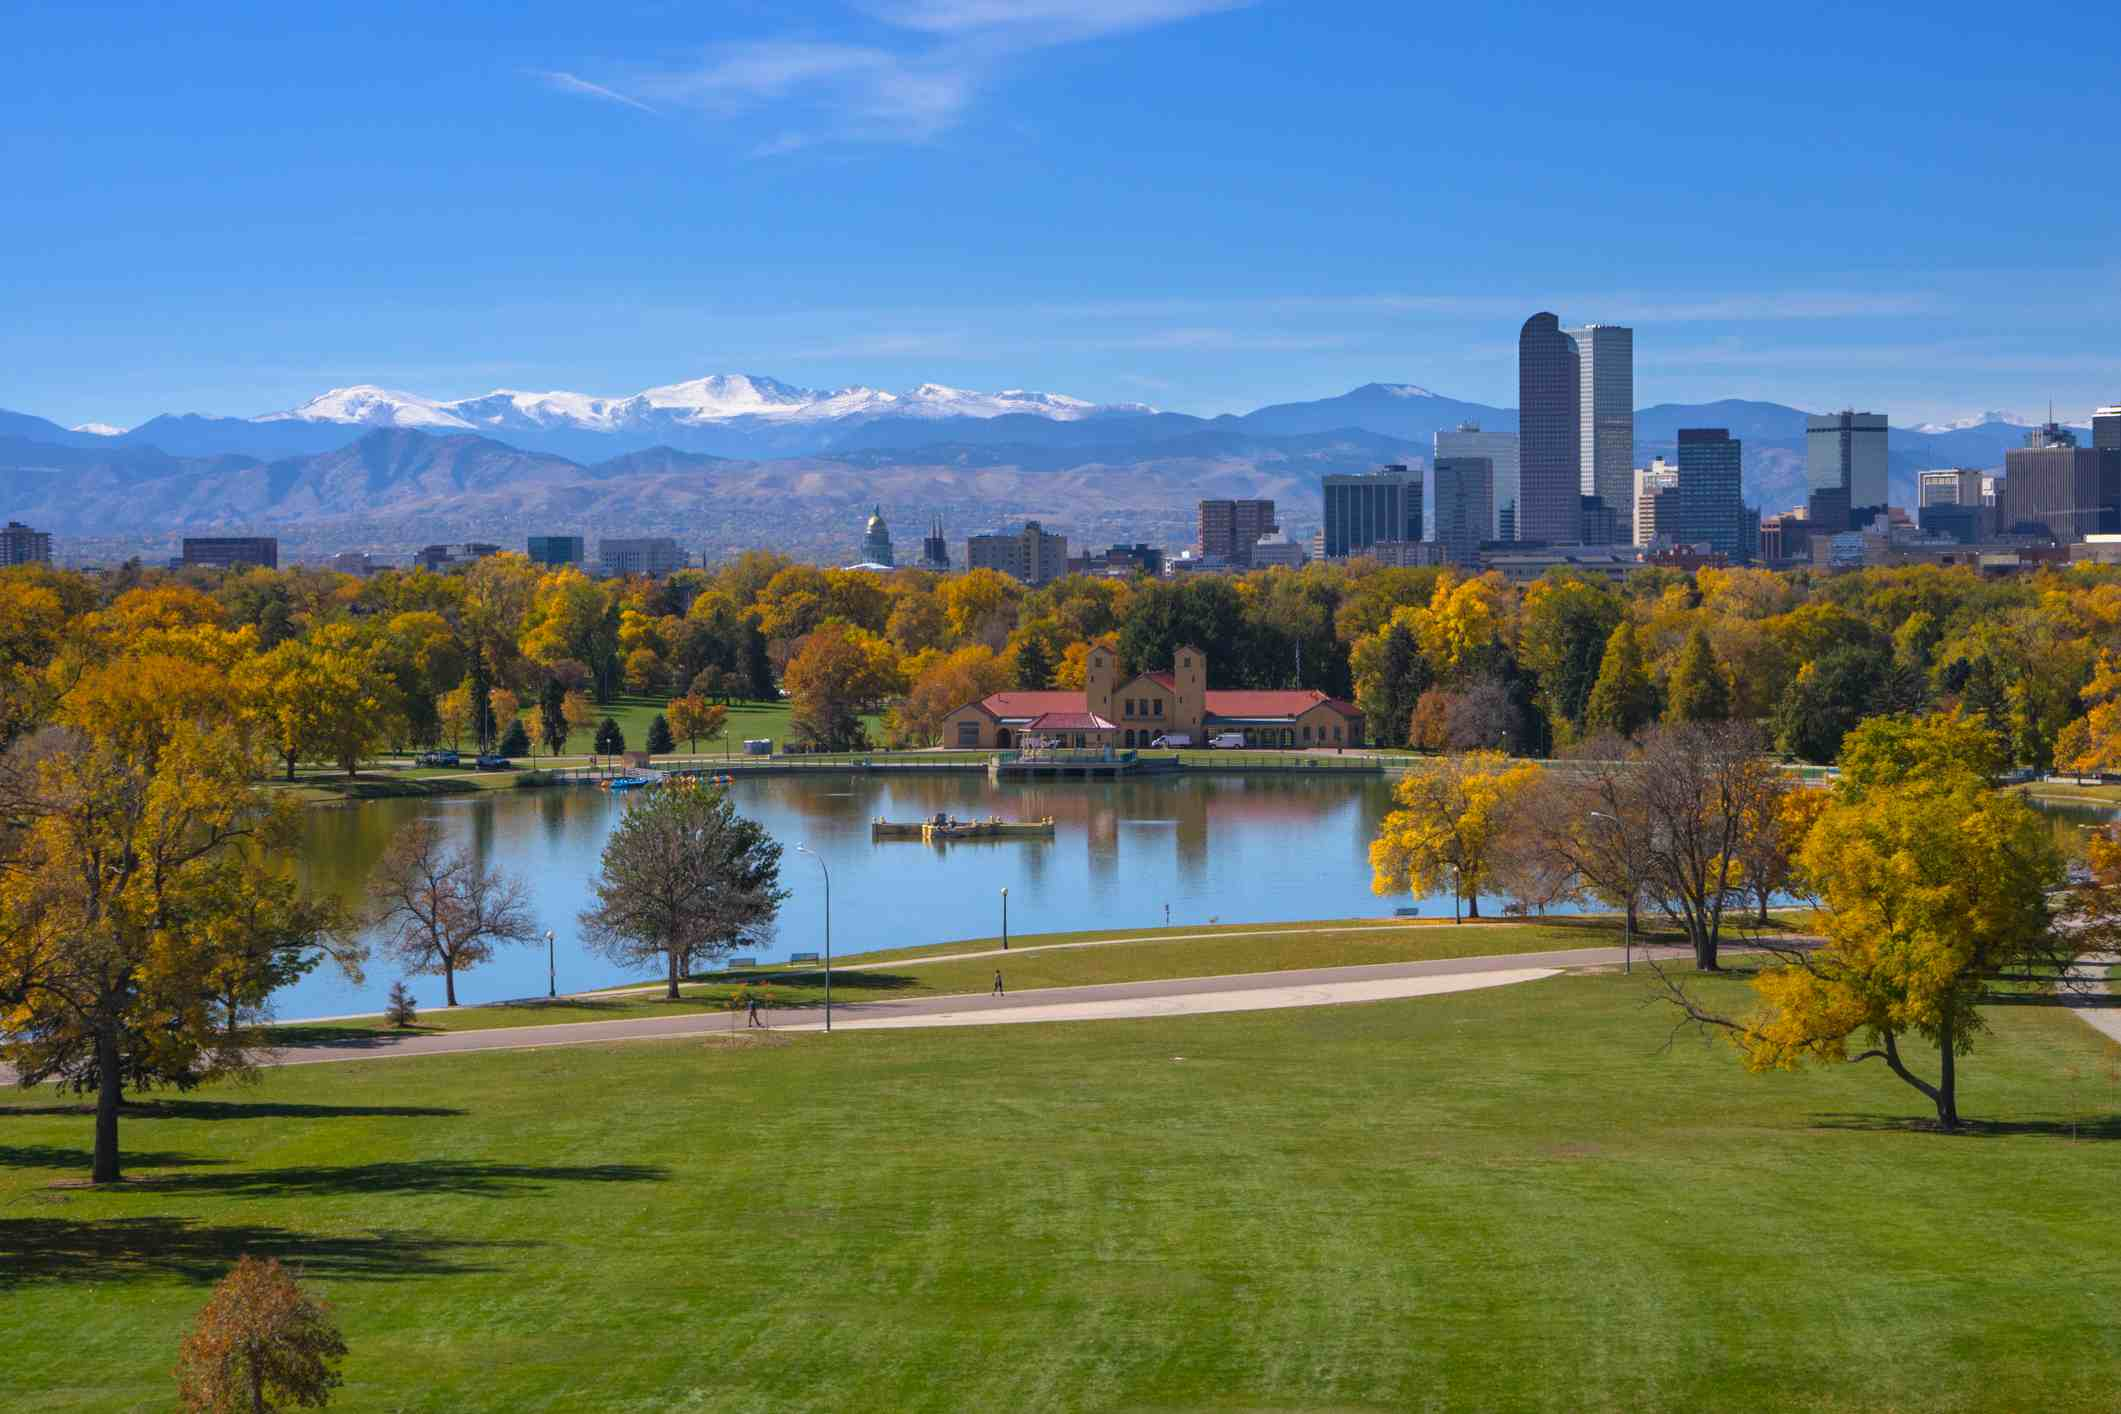 城市公园_Top 10 Neighborhoods to Explore in Denver